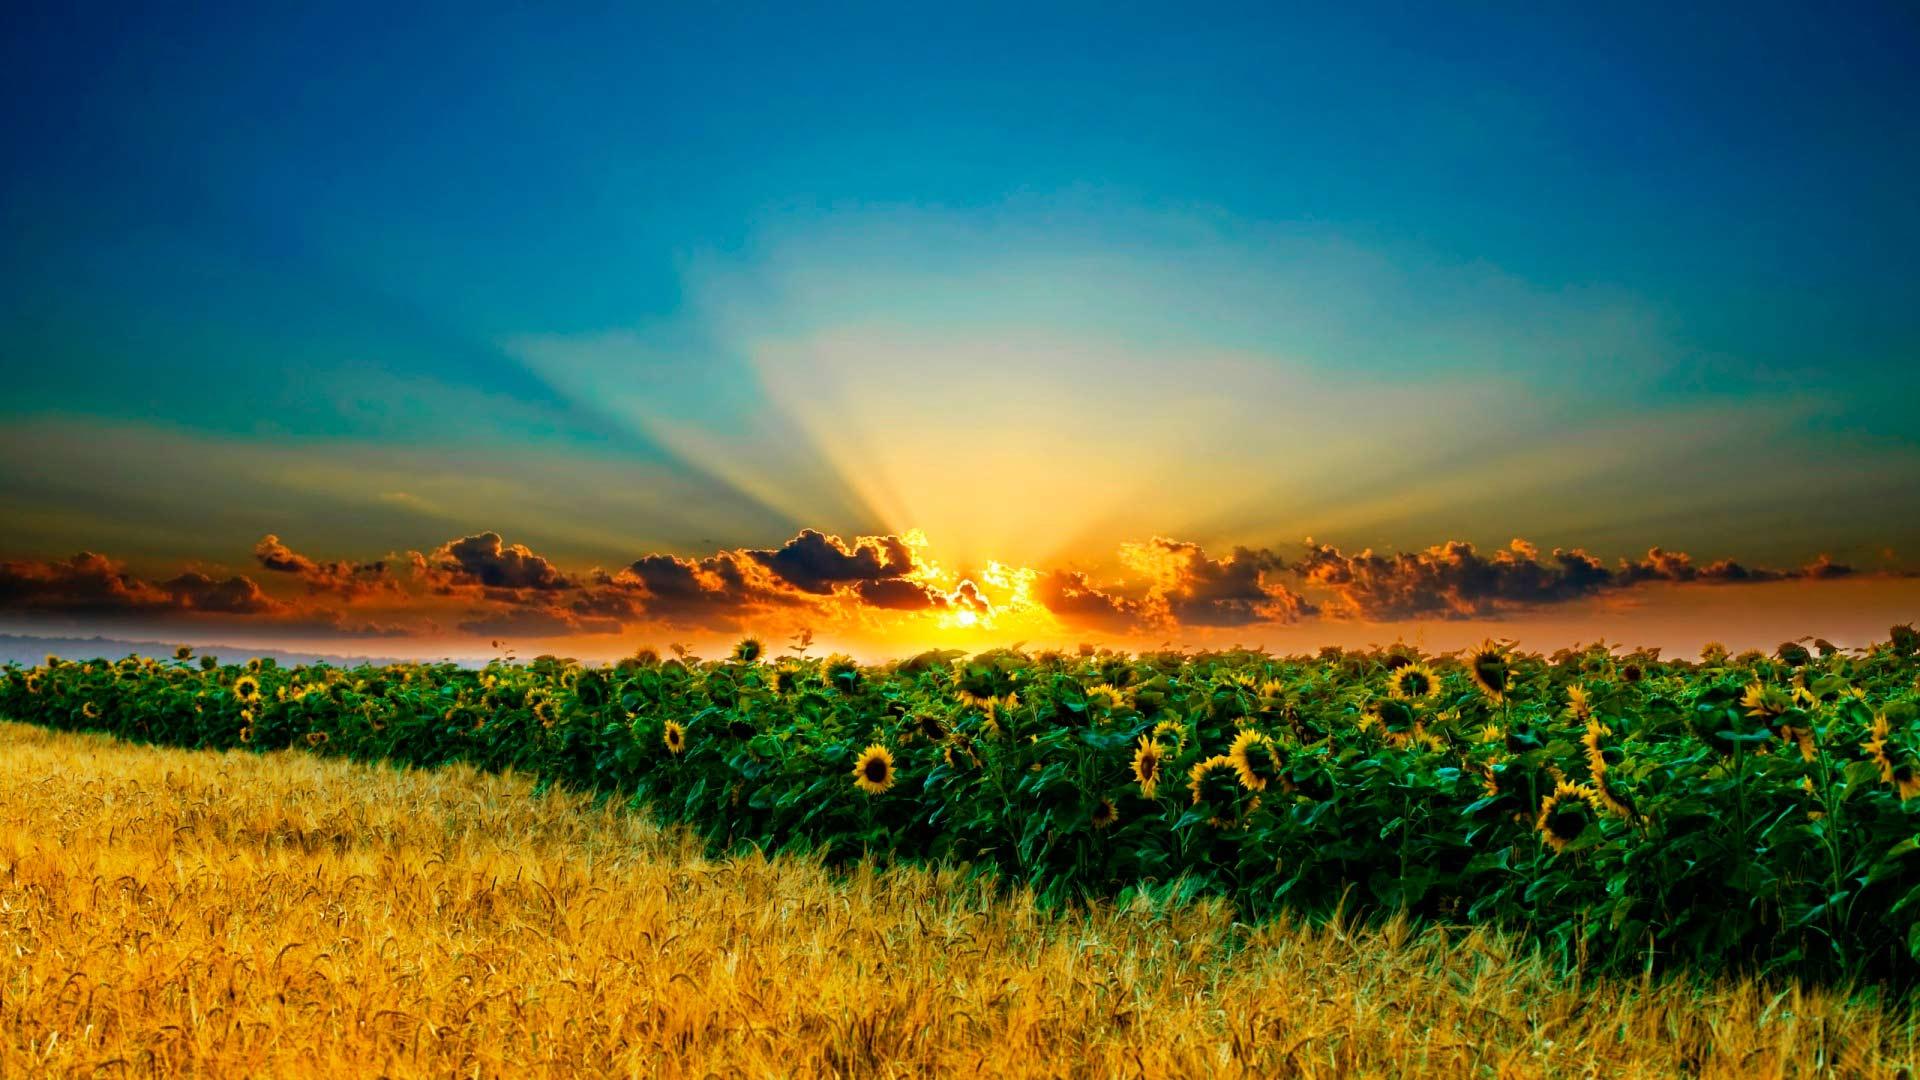 золотое небо обои